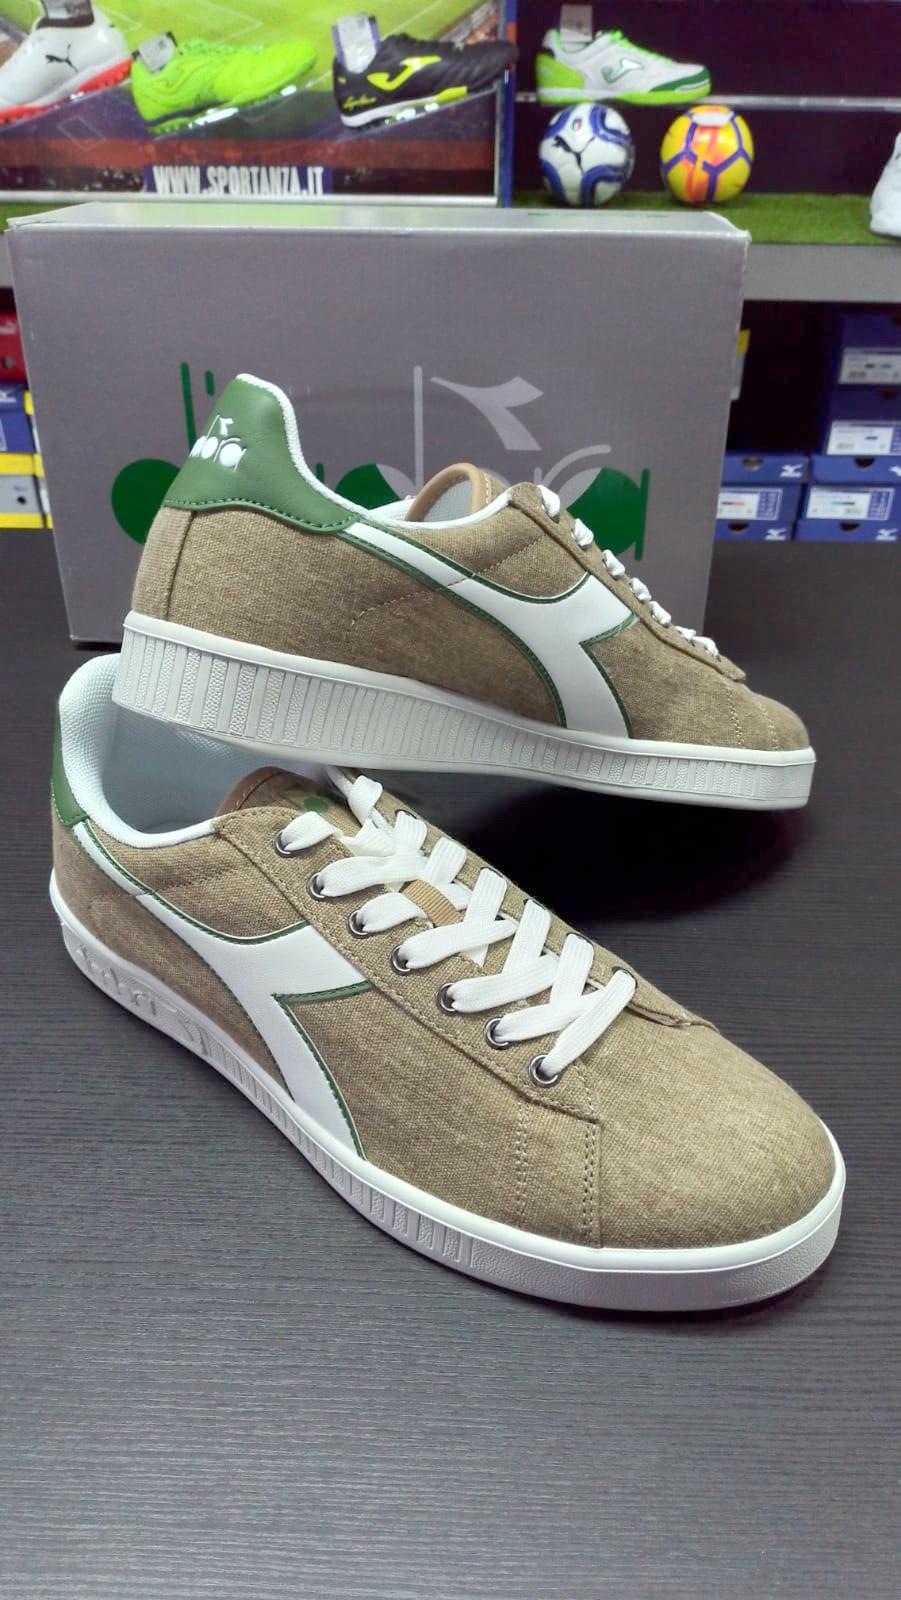 Diadora Scarpe Sneakers Ginnastica Tennis LifeStyle Beige Game ... 9f6a7475a3b